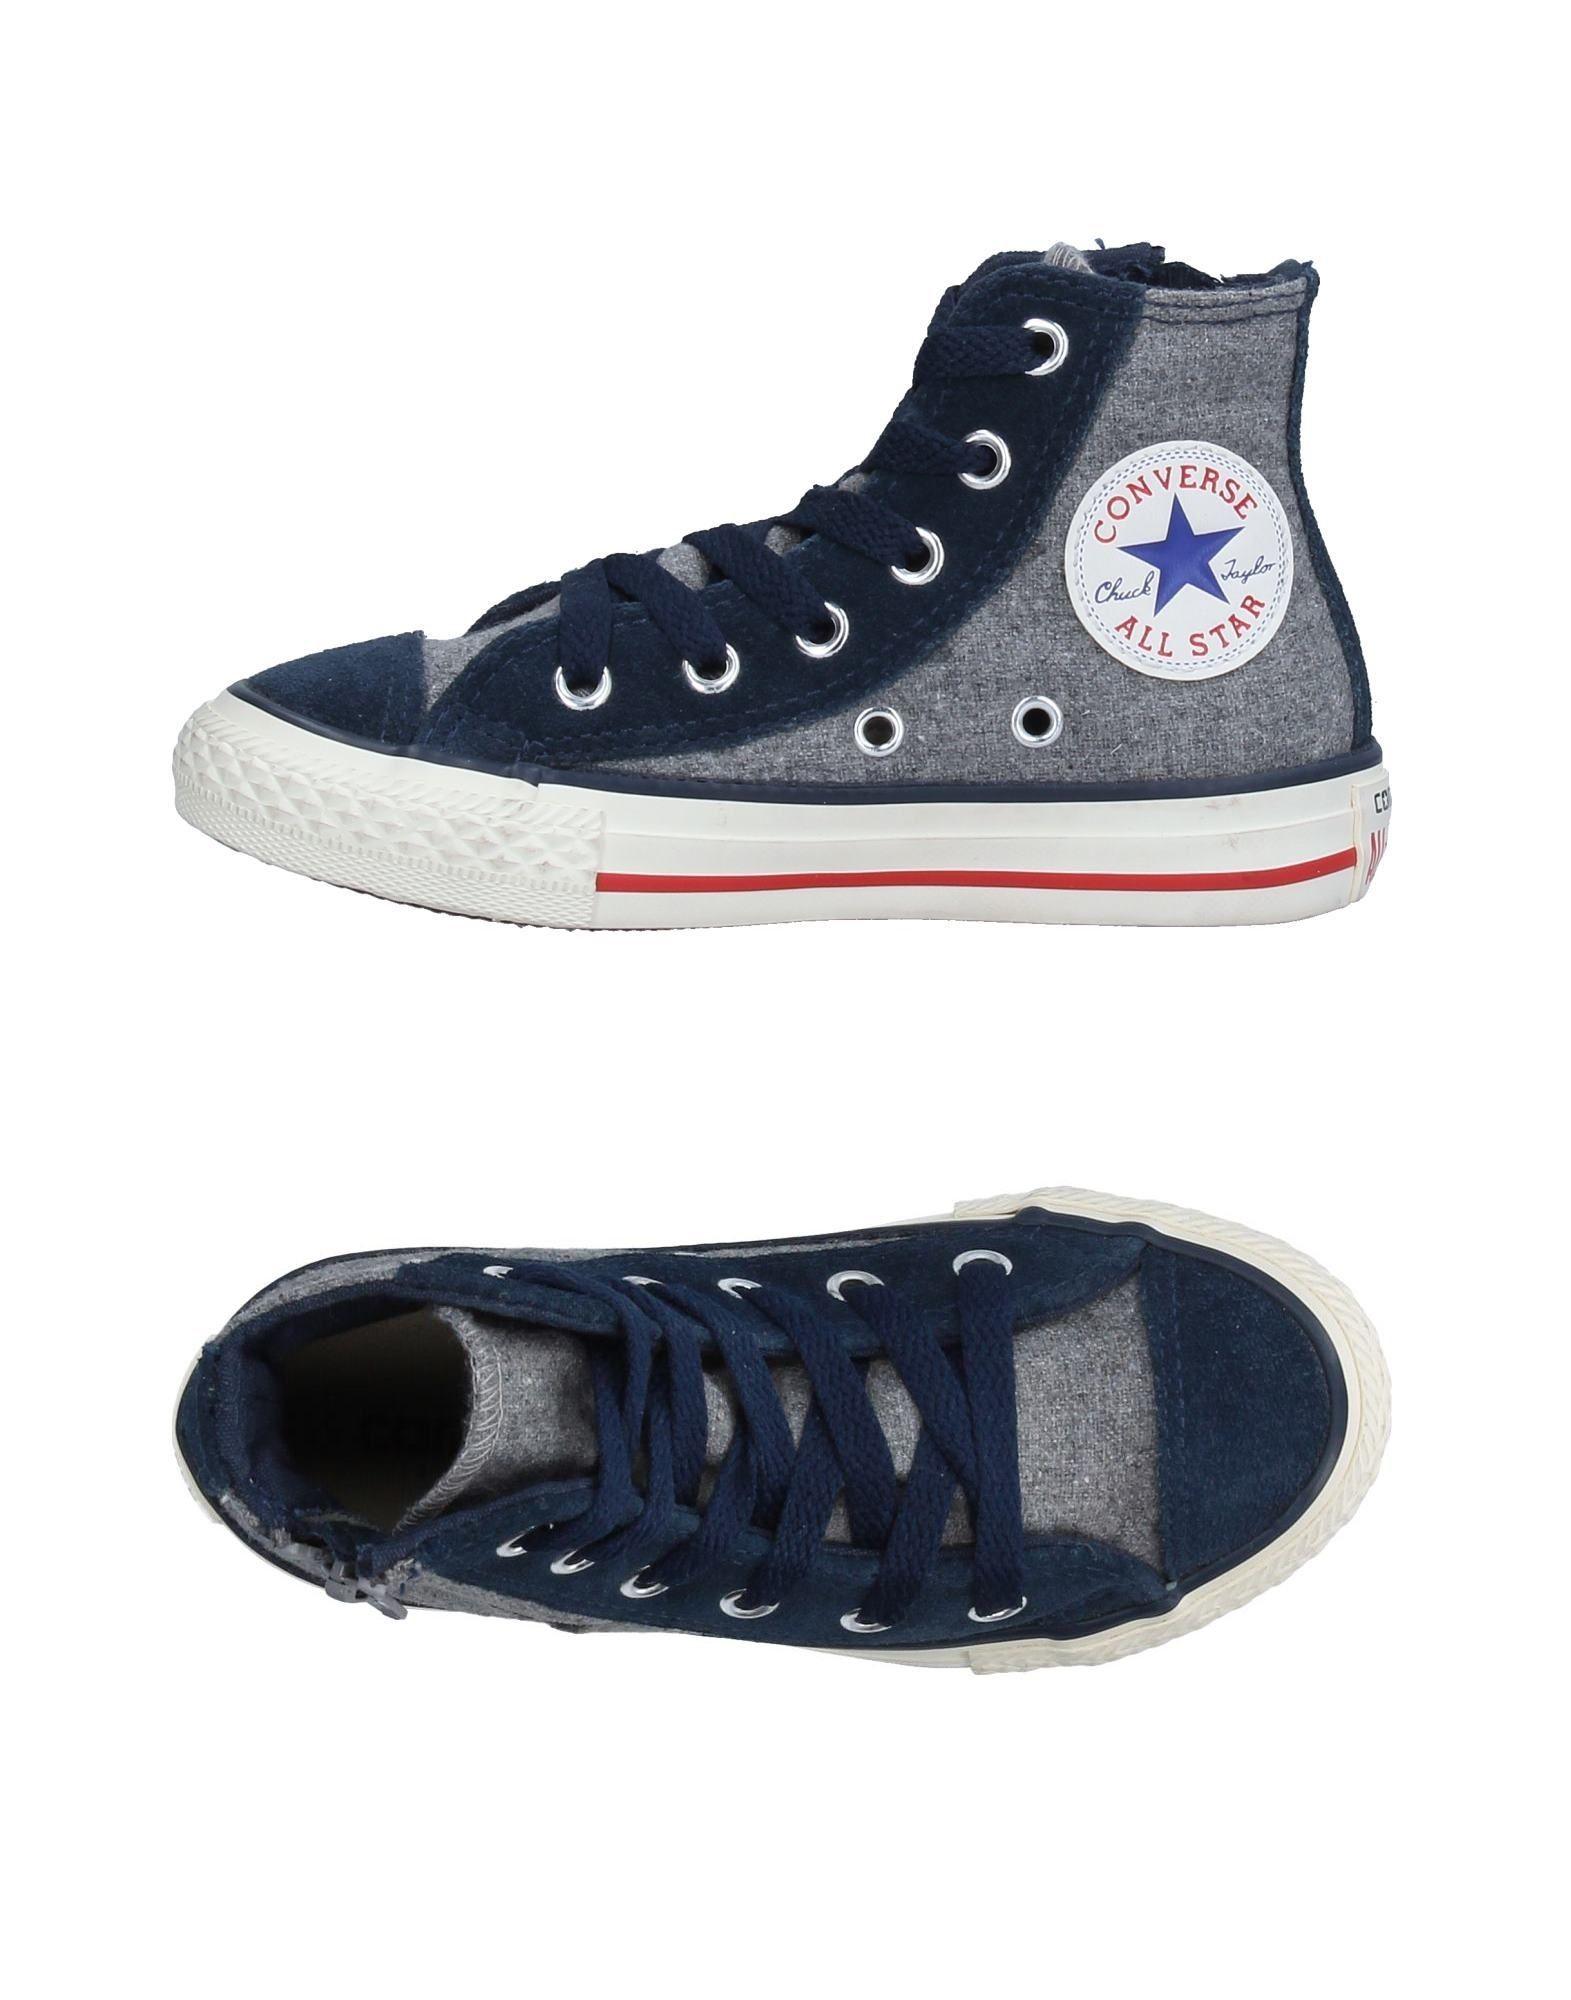 CONVERSE ALL STAR Jungen 3-8 jahre High Sneakers & Tennisschuhe Farbe Grau Größe 21